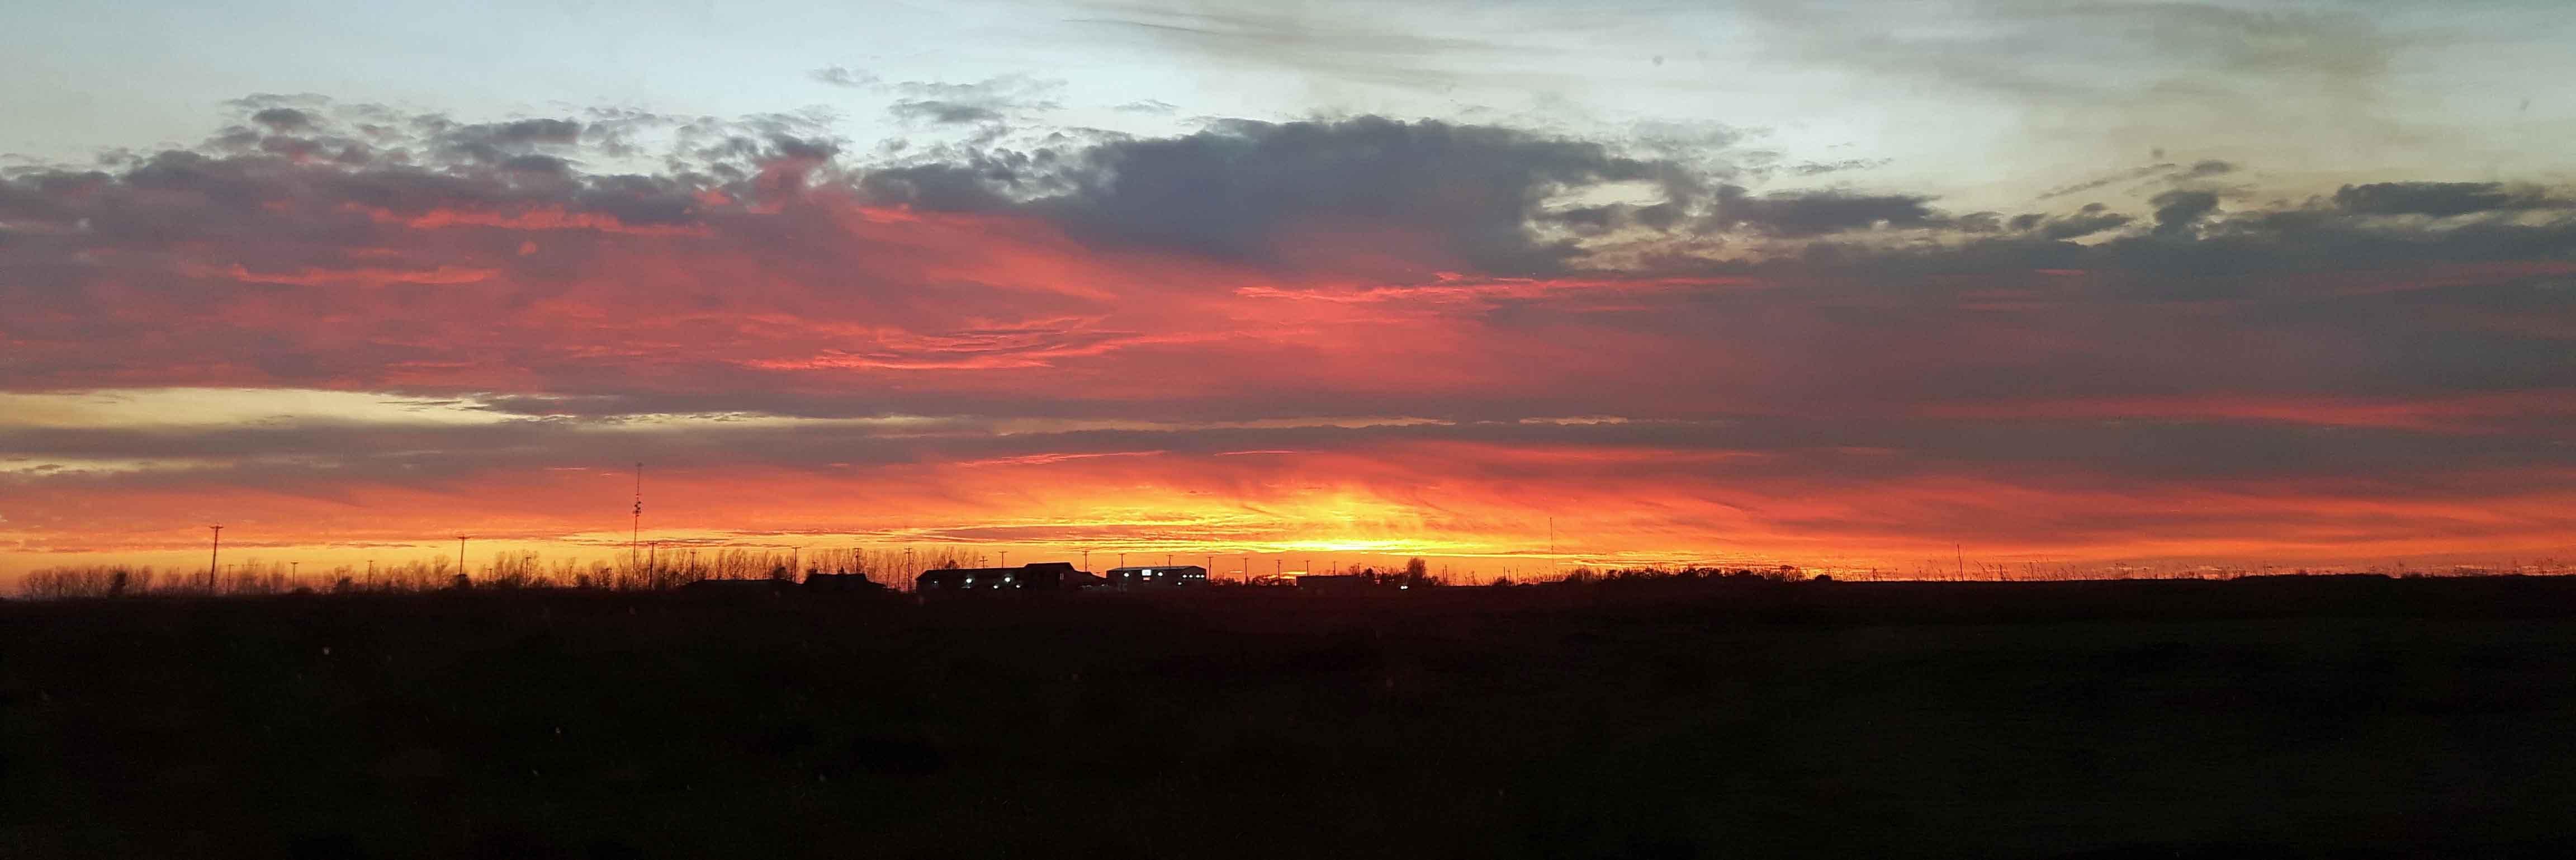 Free stock photo of evening sun, prairie sky, sun, sunset